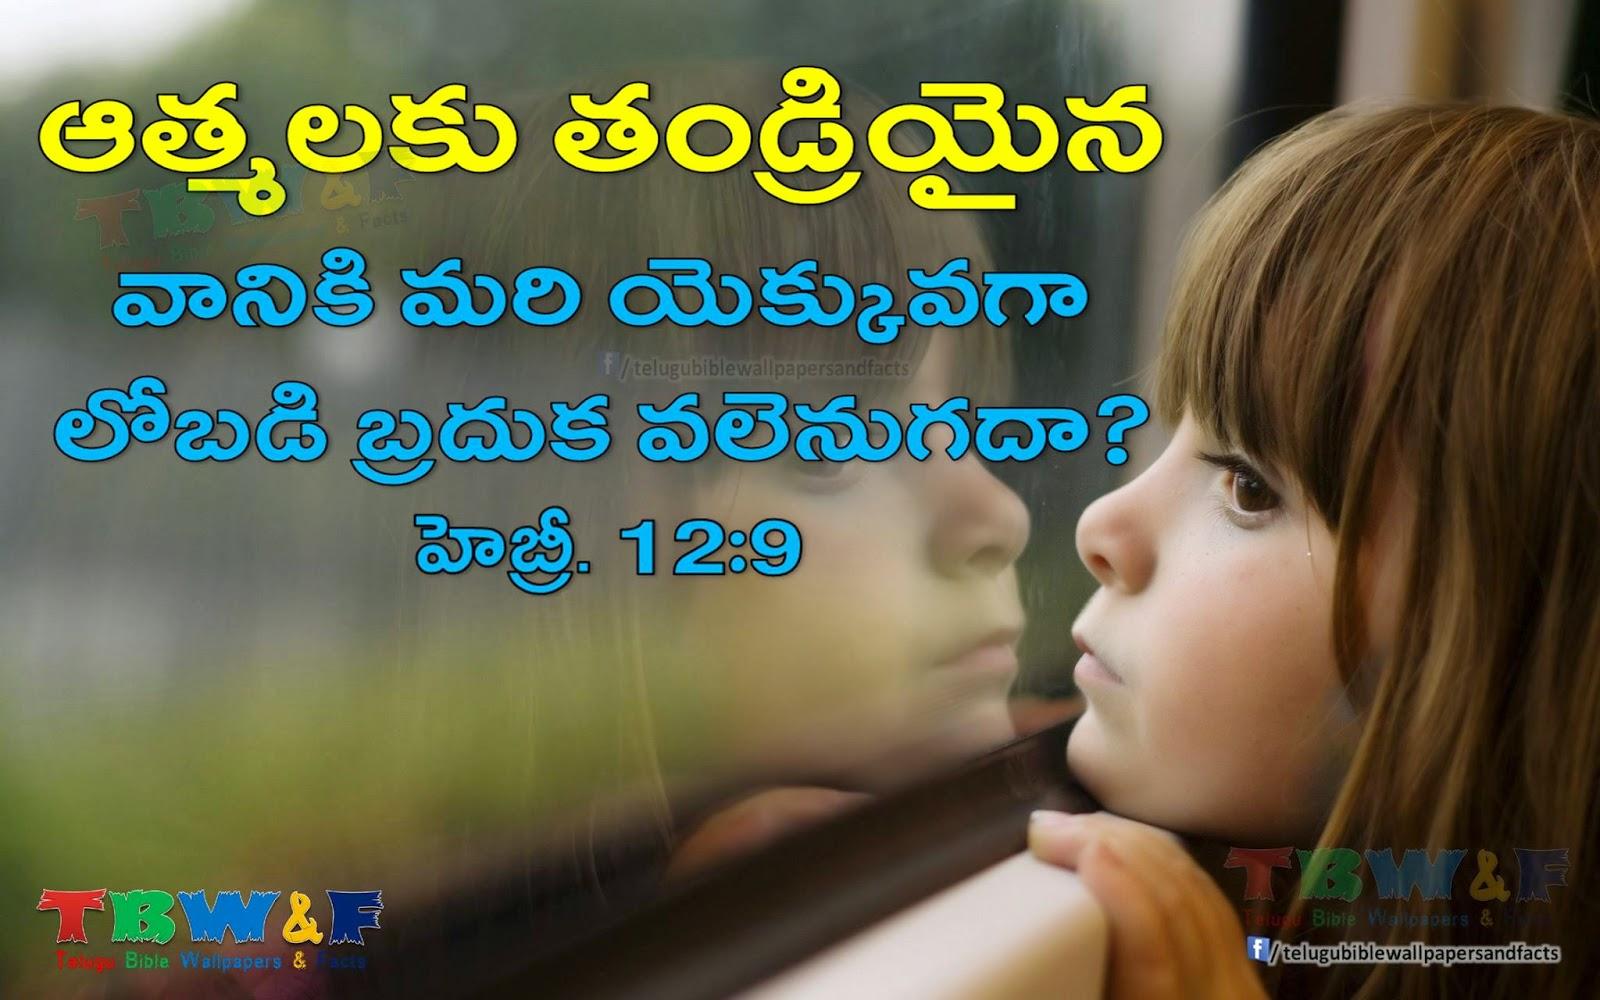 Telugu Christian Wallpapers The Christian Messenger